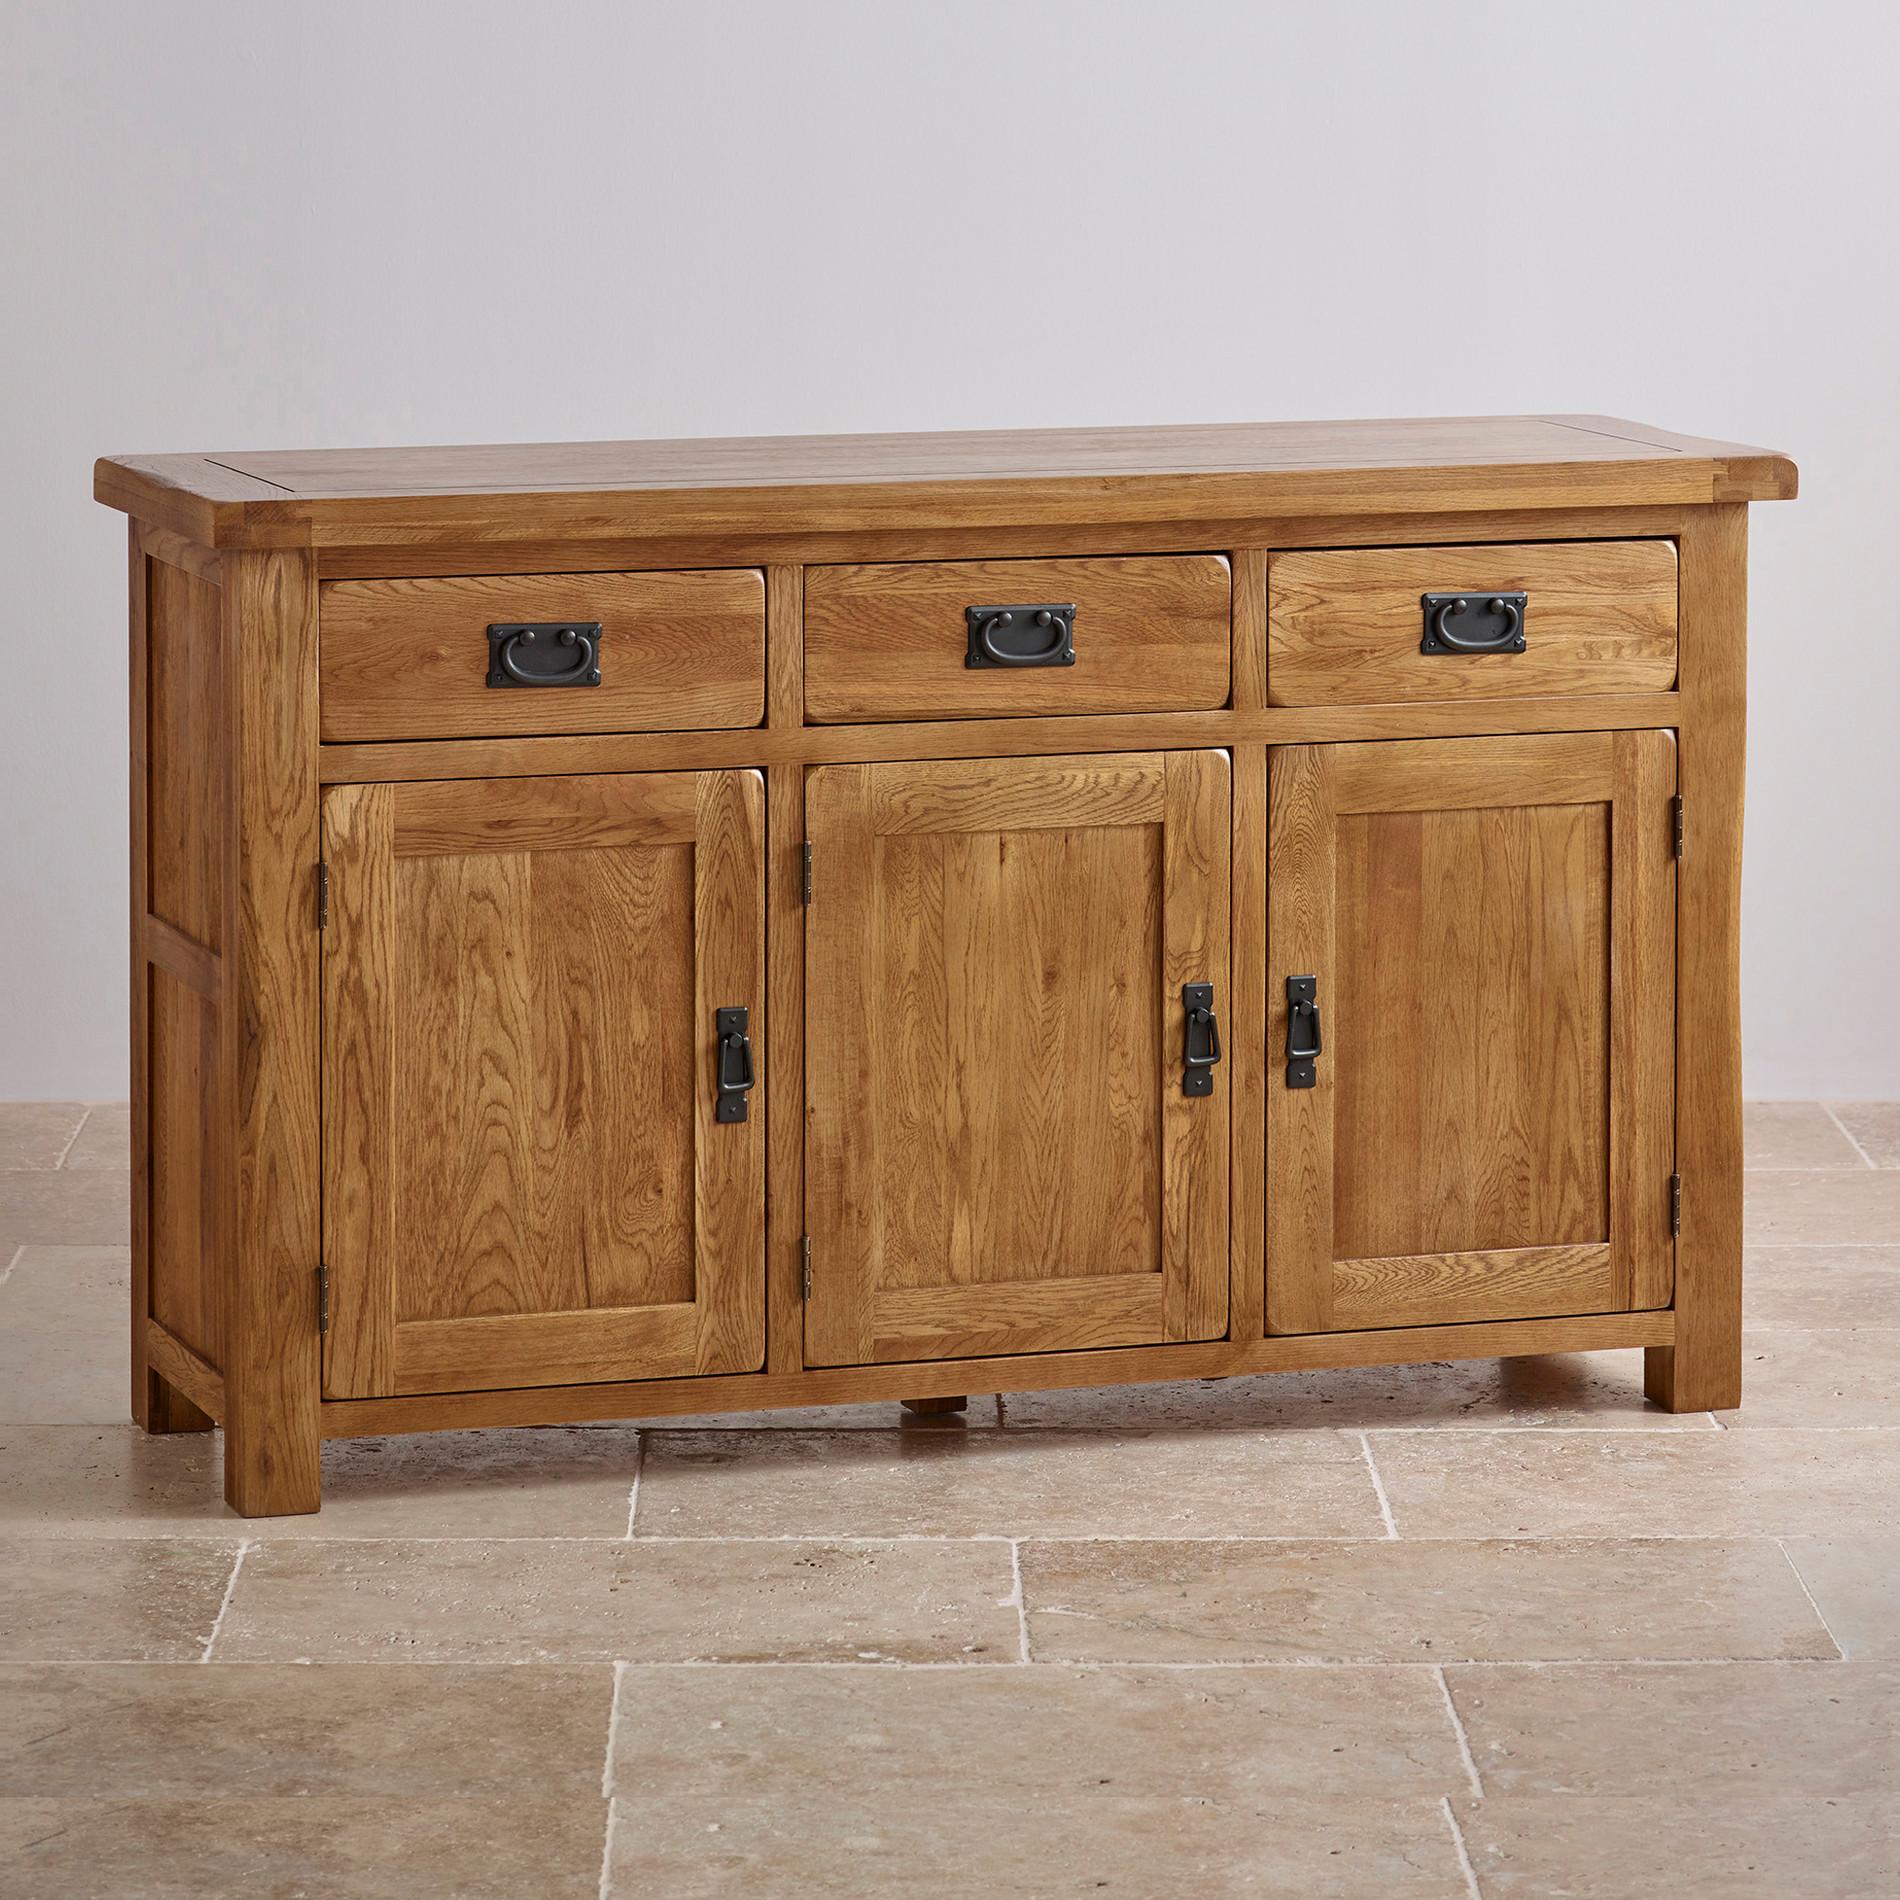 Oak furniture 0 SRFHWAC